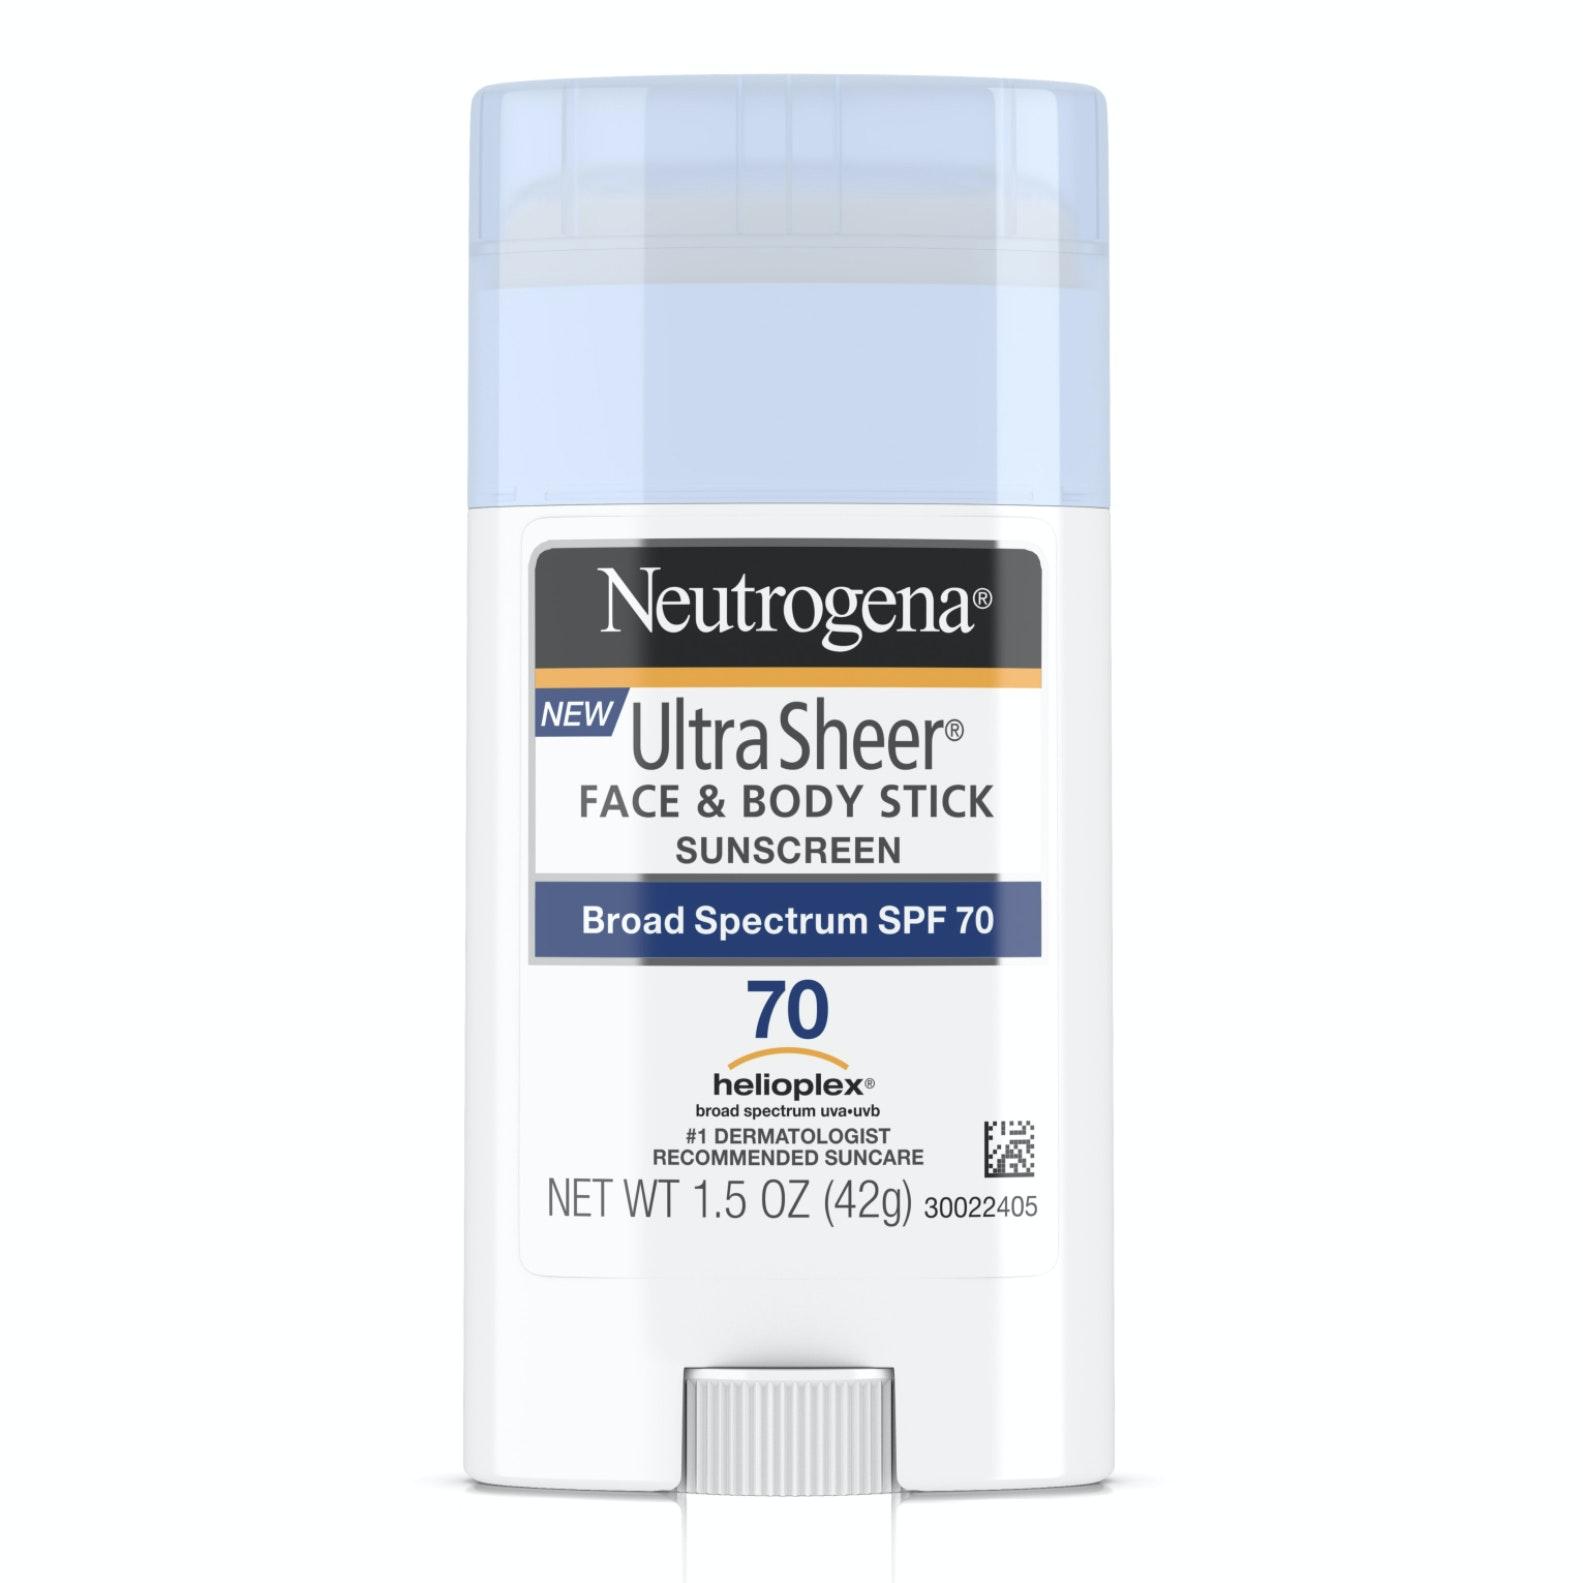 Neutrogena Ultra Sheer® Non-Greasy Sunscreen Stick SPF 70